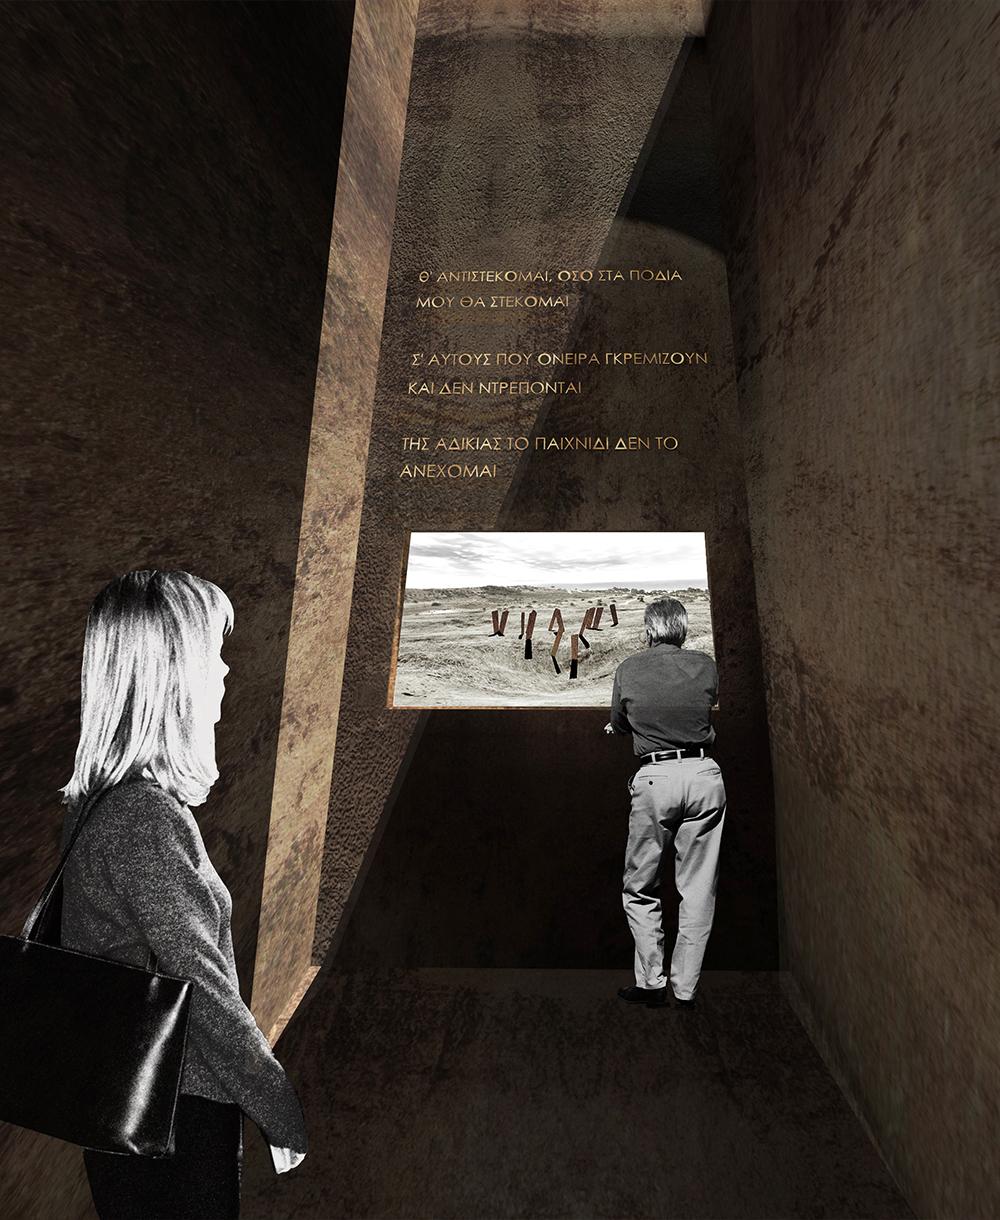 Optical view of the memorial